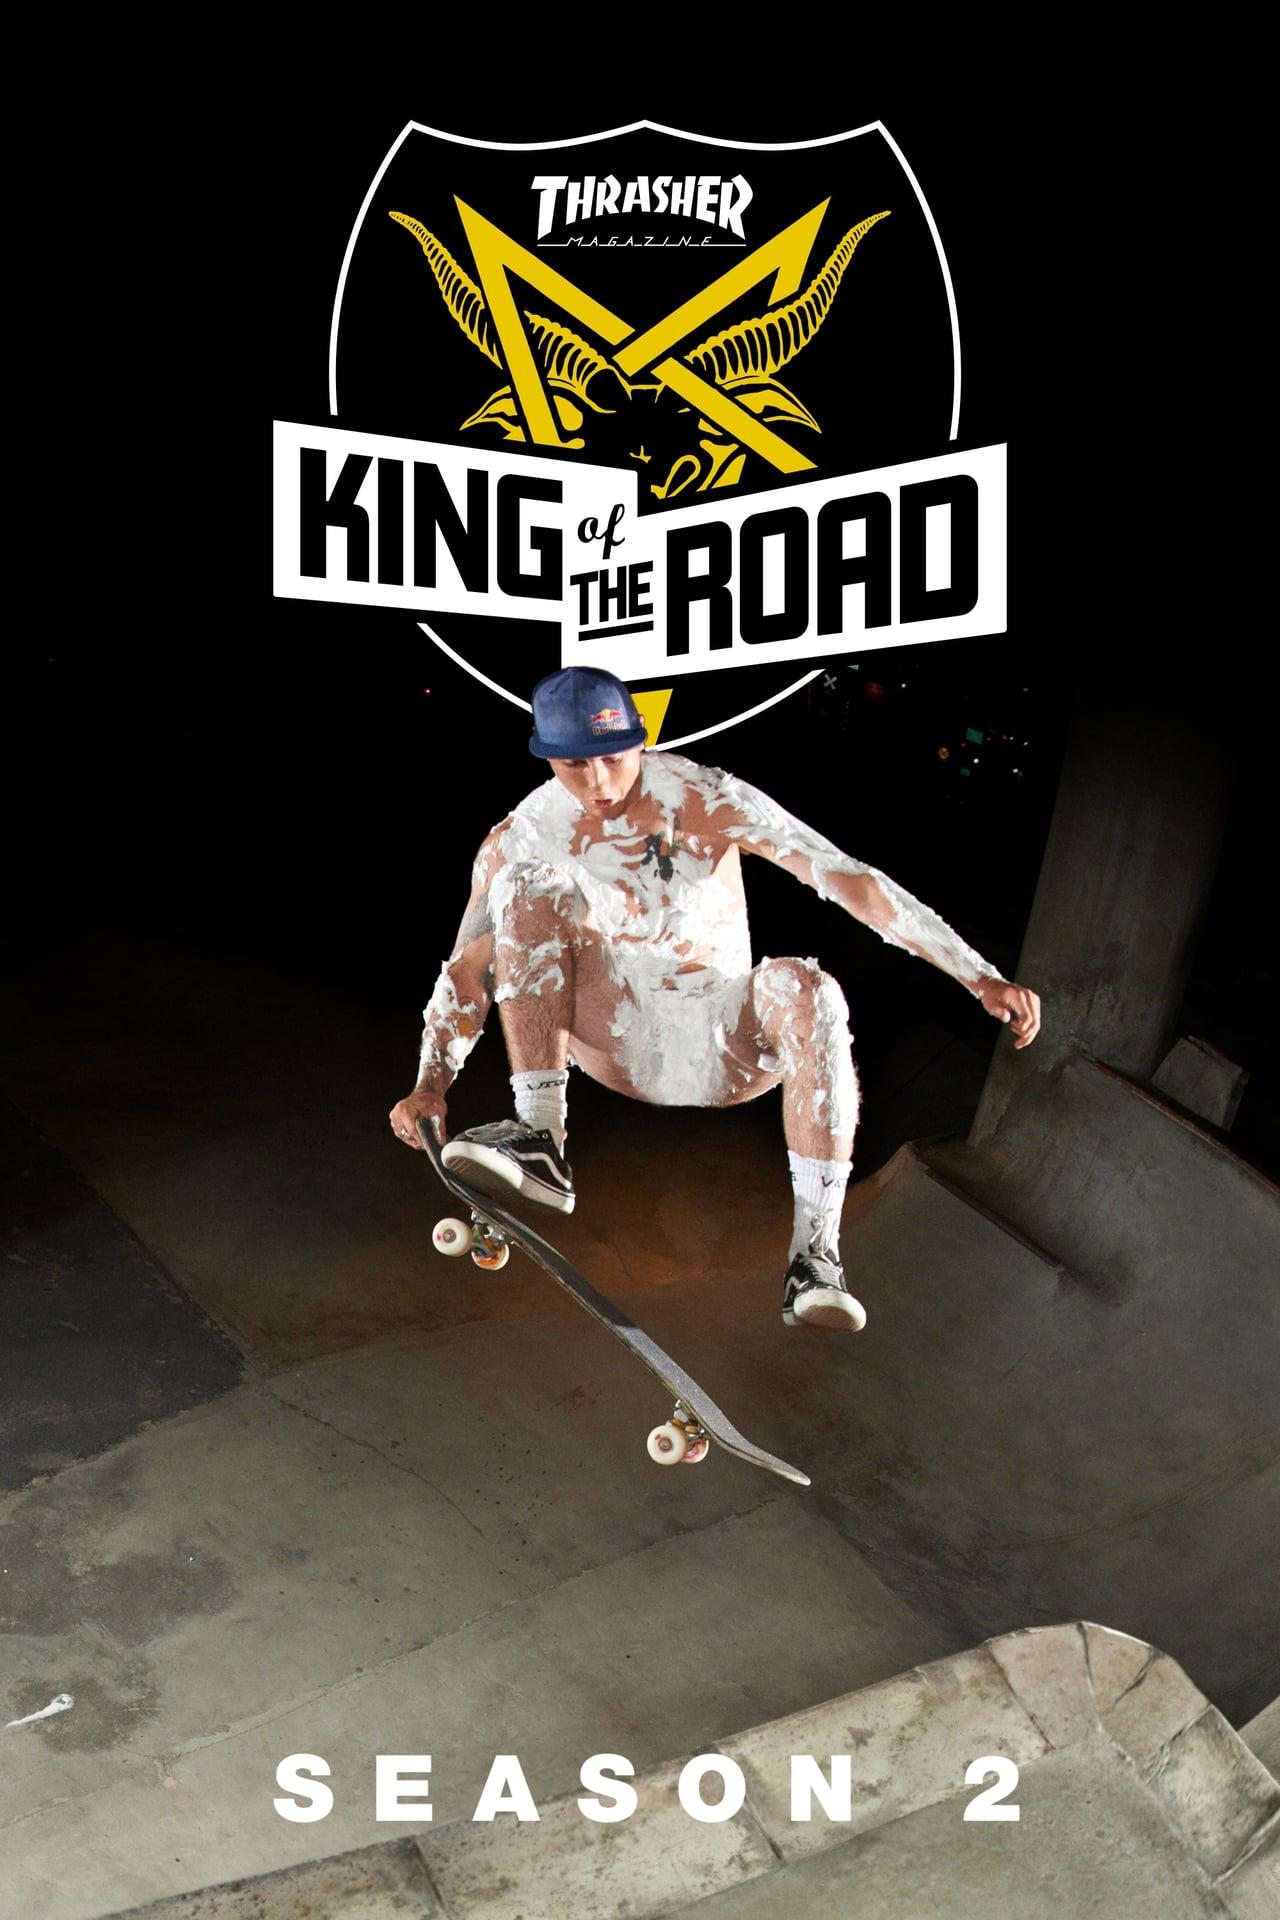 Putlocker King Of The Road Season 2 (2017)